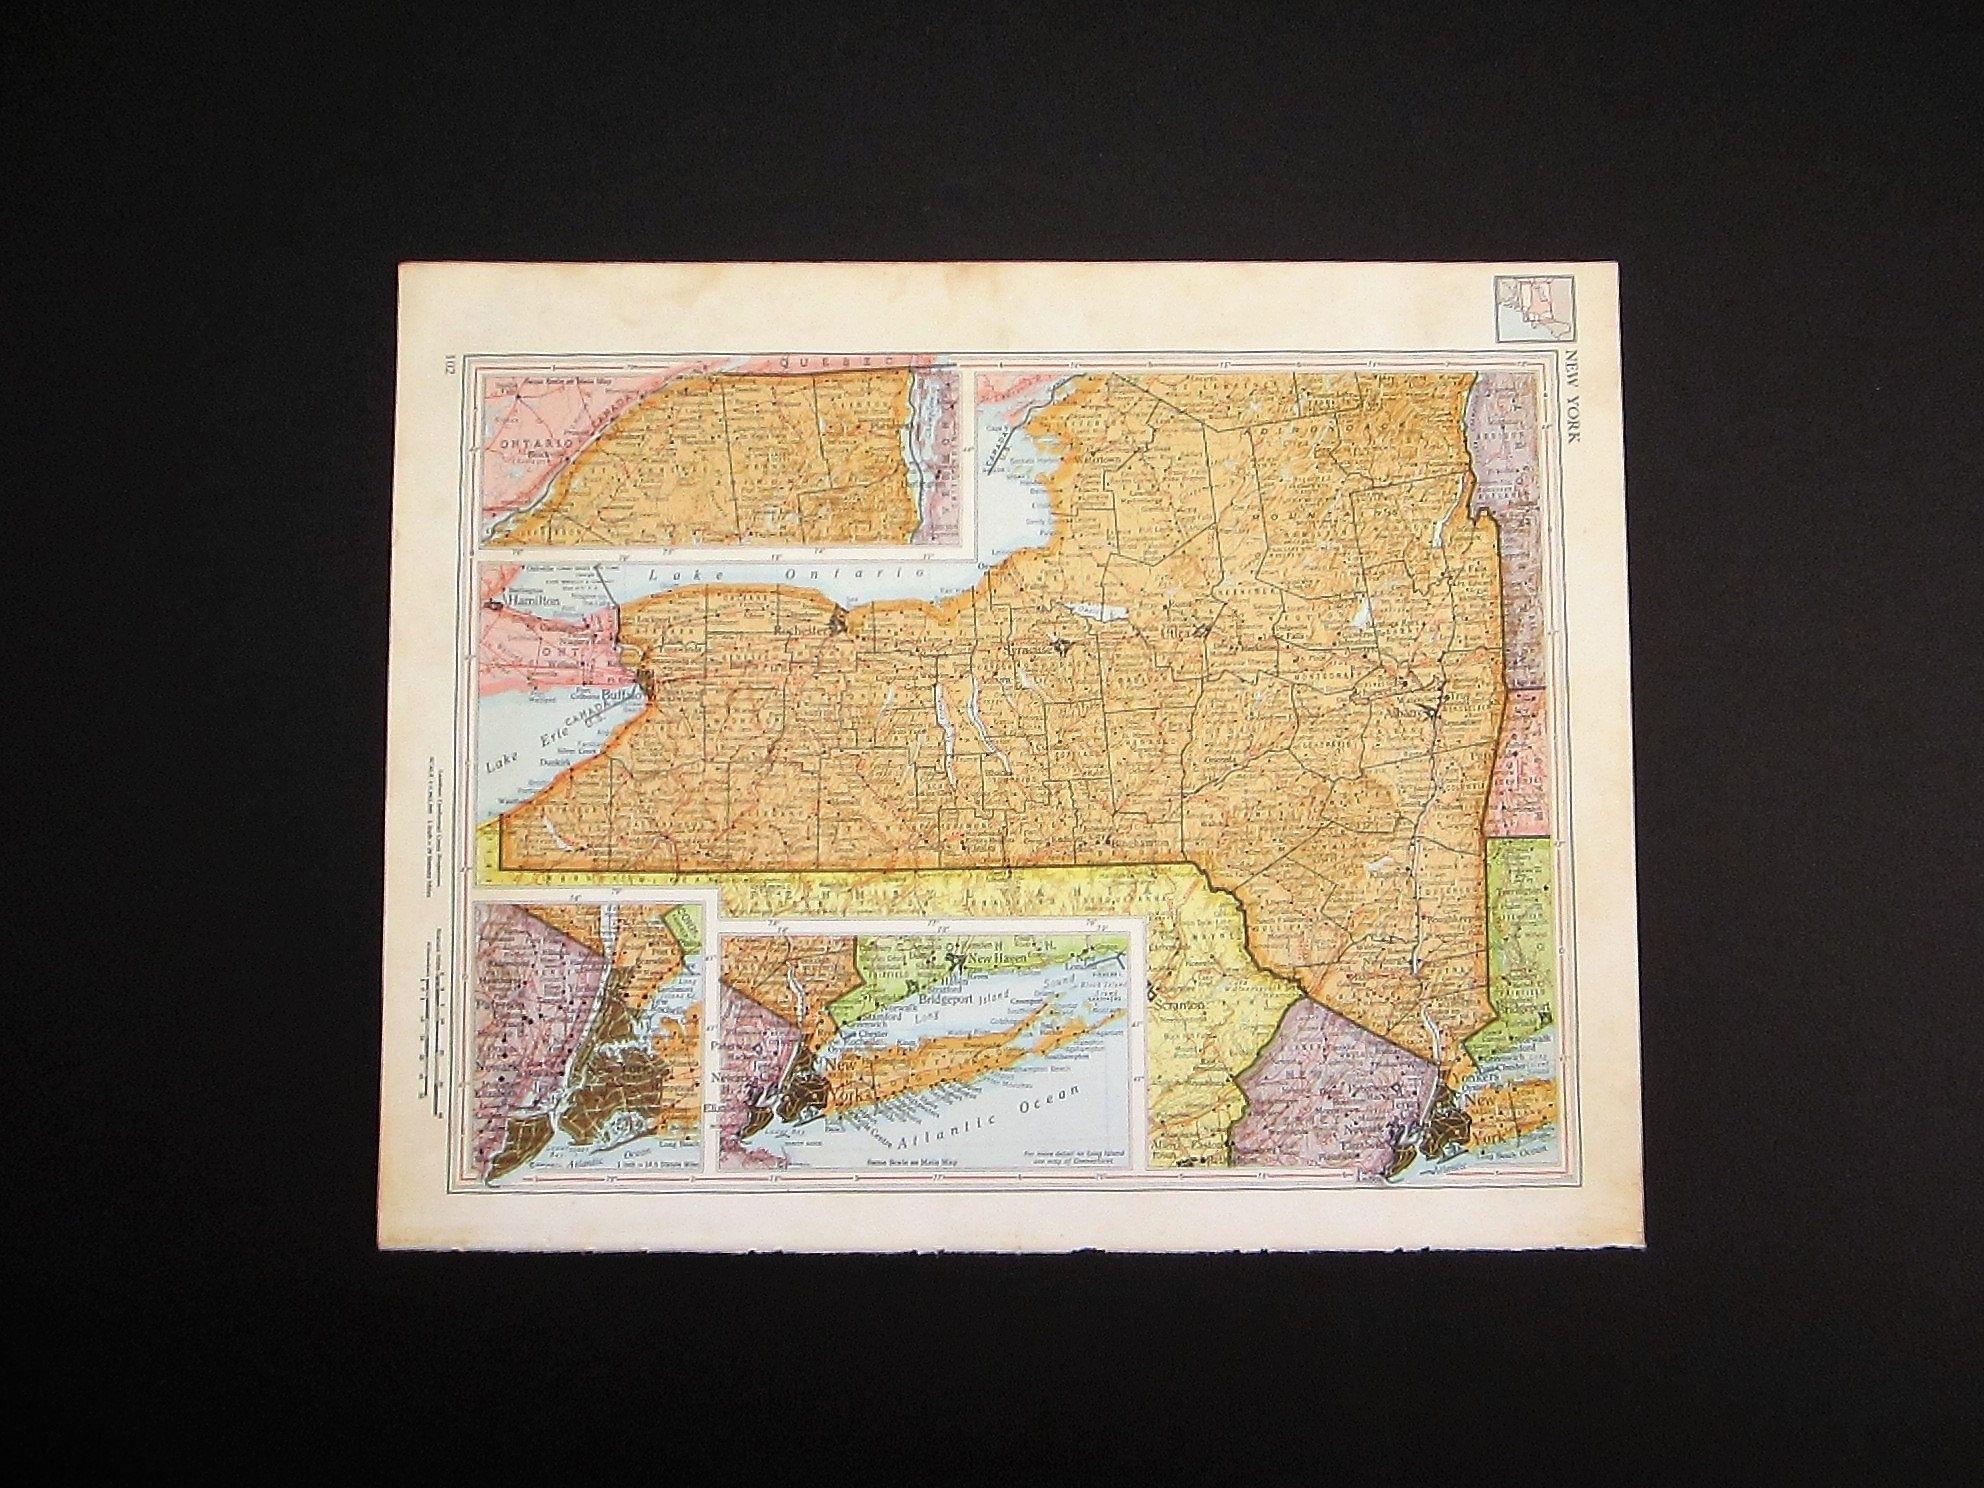 1960 New York Map / Vintage Map Wall Art / Office Decor / New York Within New York City Map Wall Art (View 3 of 20)